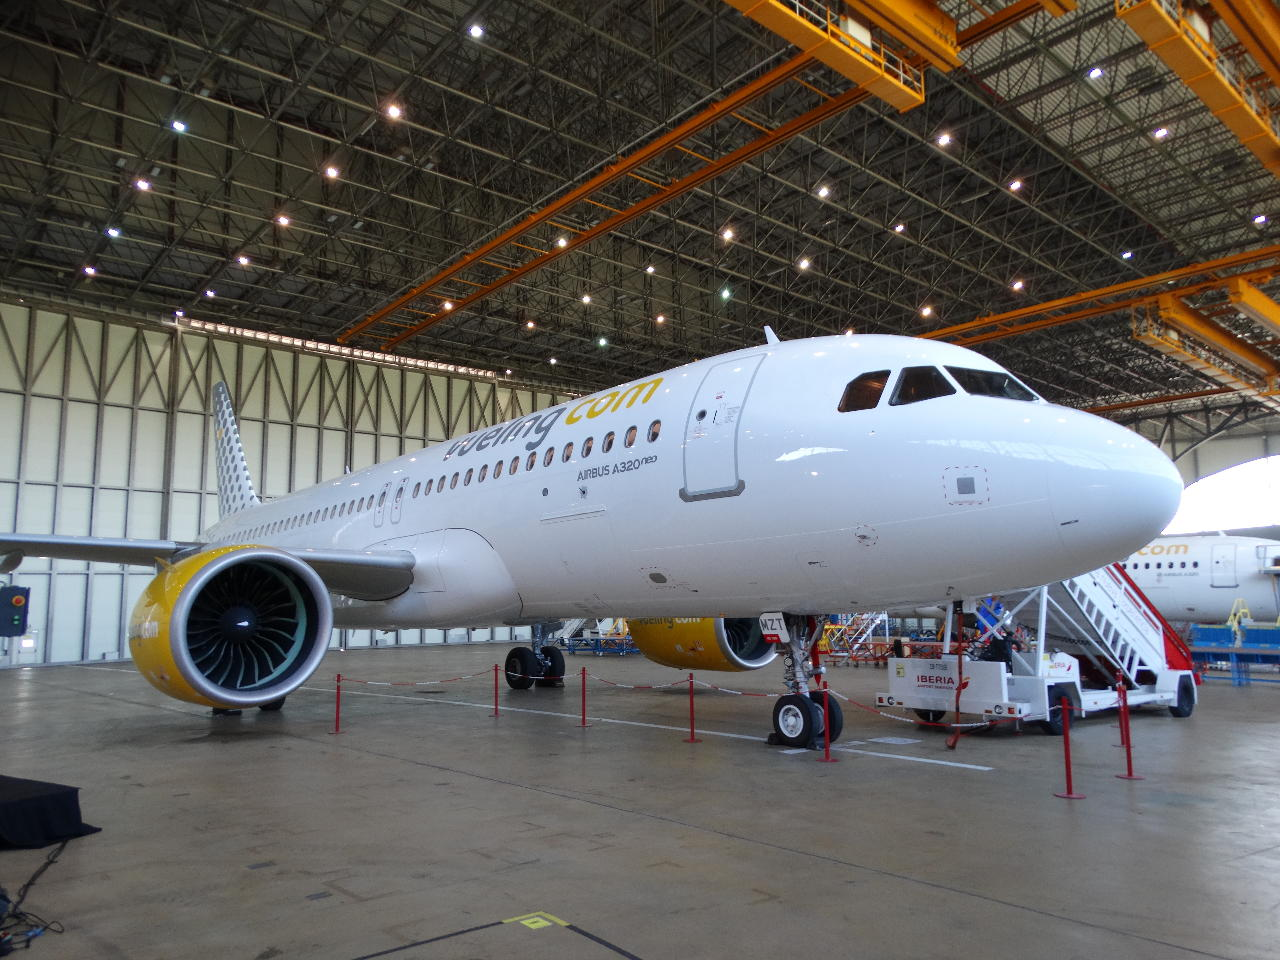 Vueling reçoit son premier A320neo